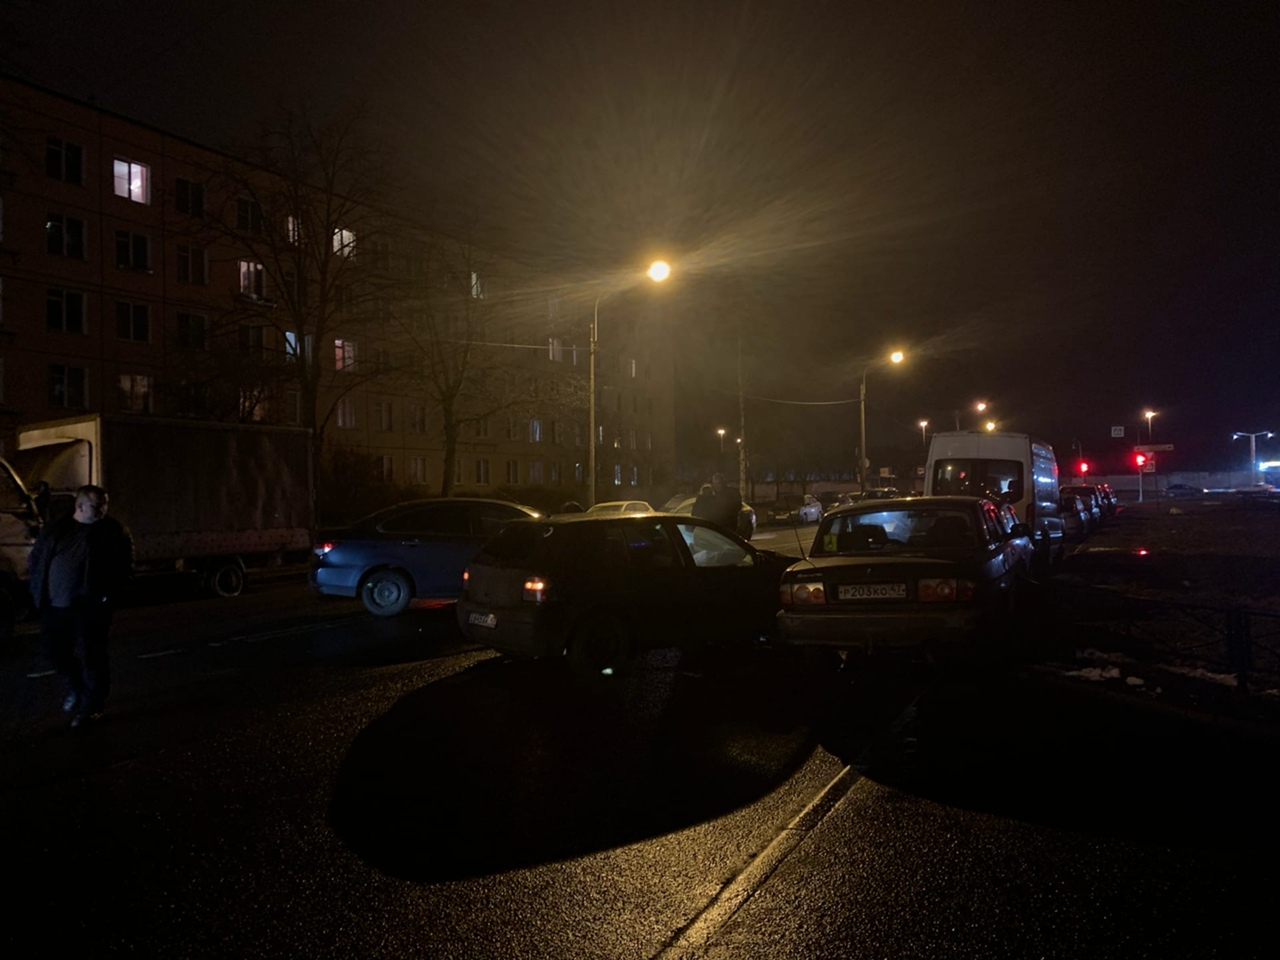 На улице Солдата Корзуна Альмера не пропустила Фолькваген при повороте во двор. Пожарные на месте, ...